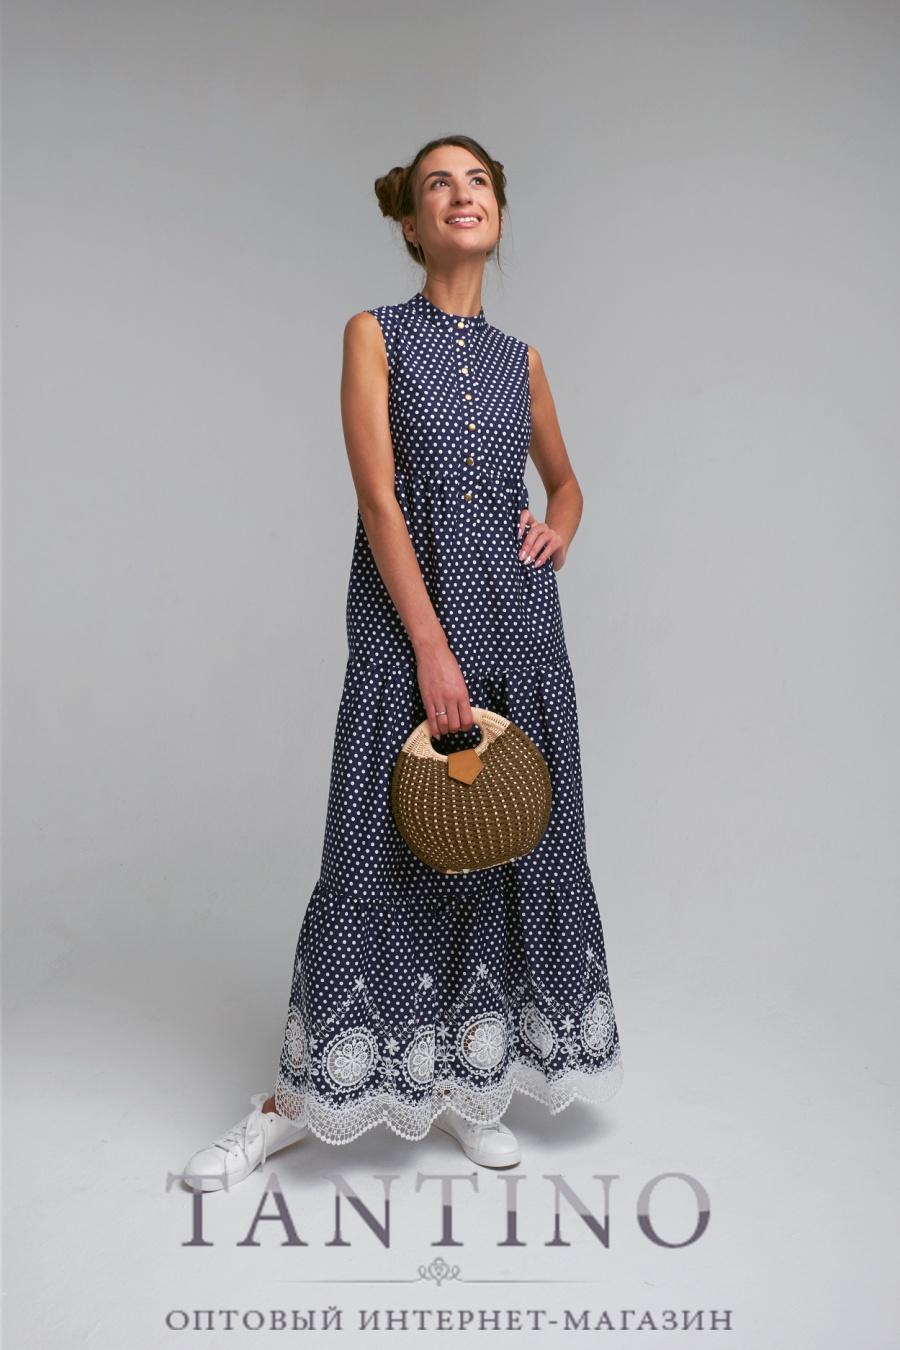 Платье Tantino, цена на LaModa 5300 руб.